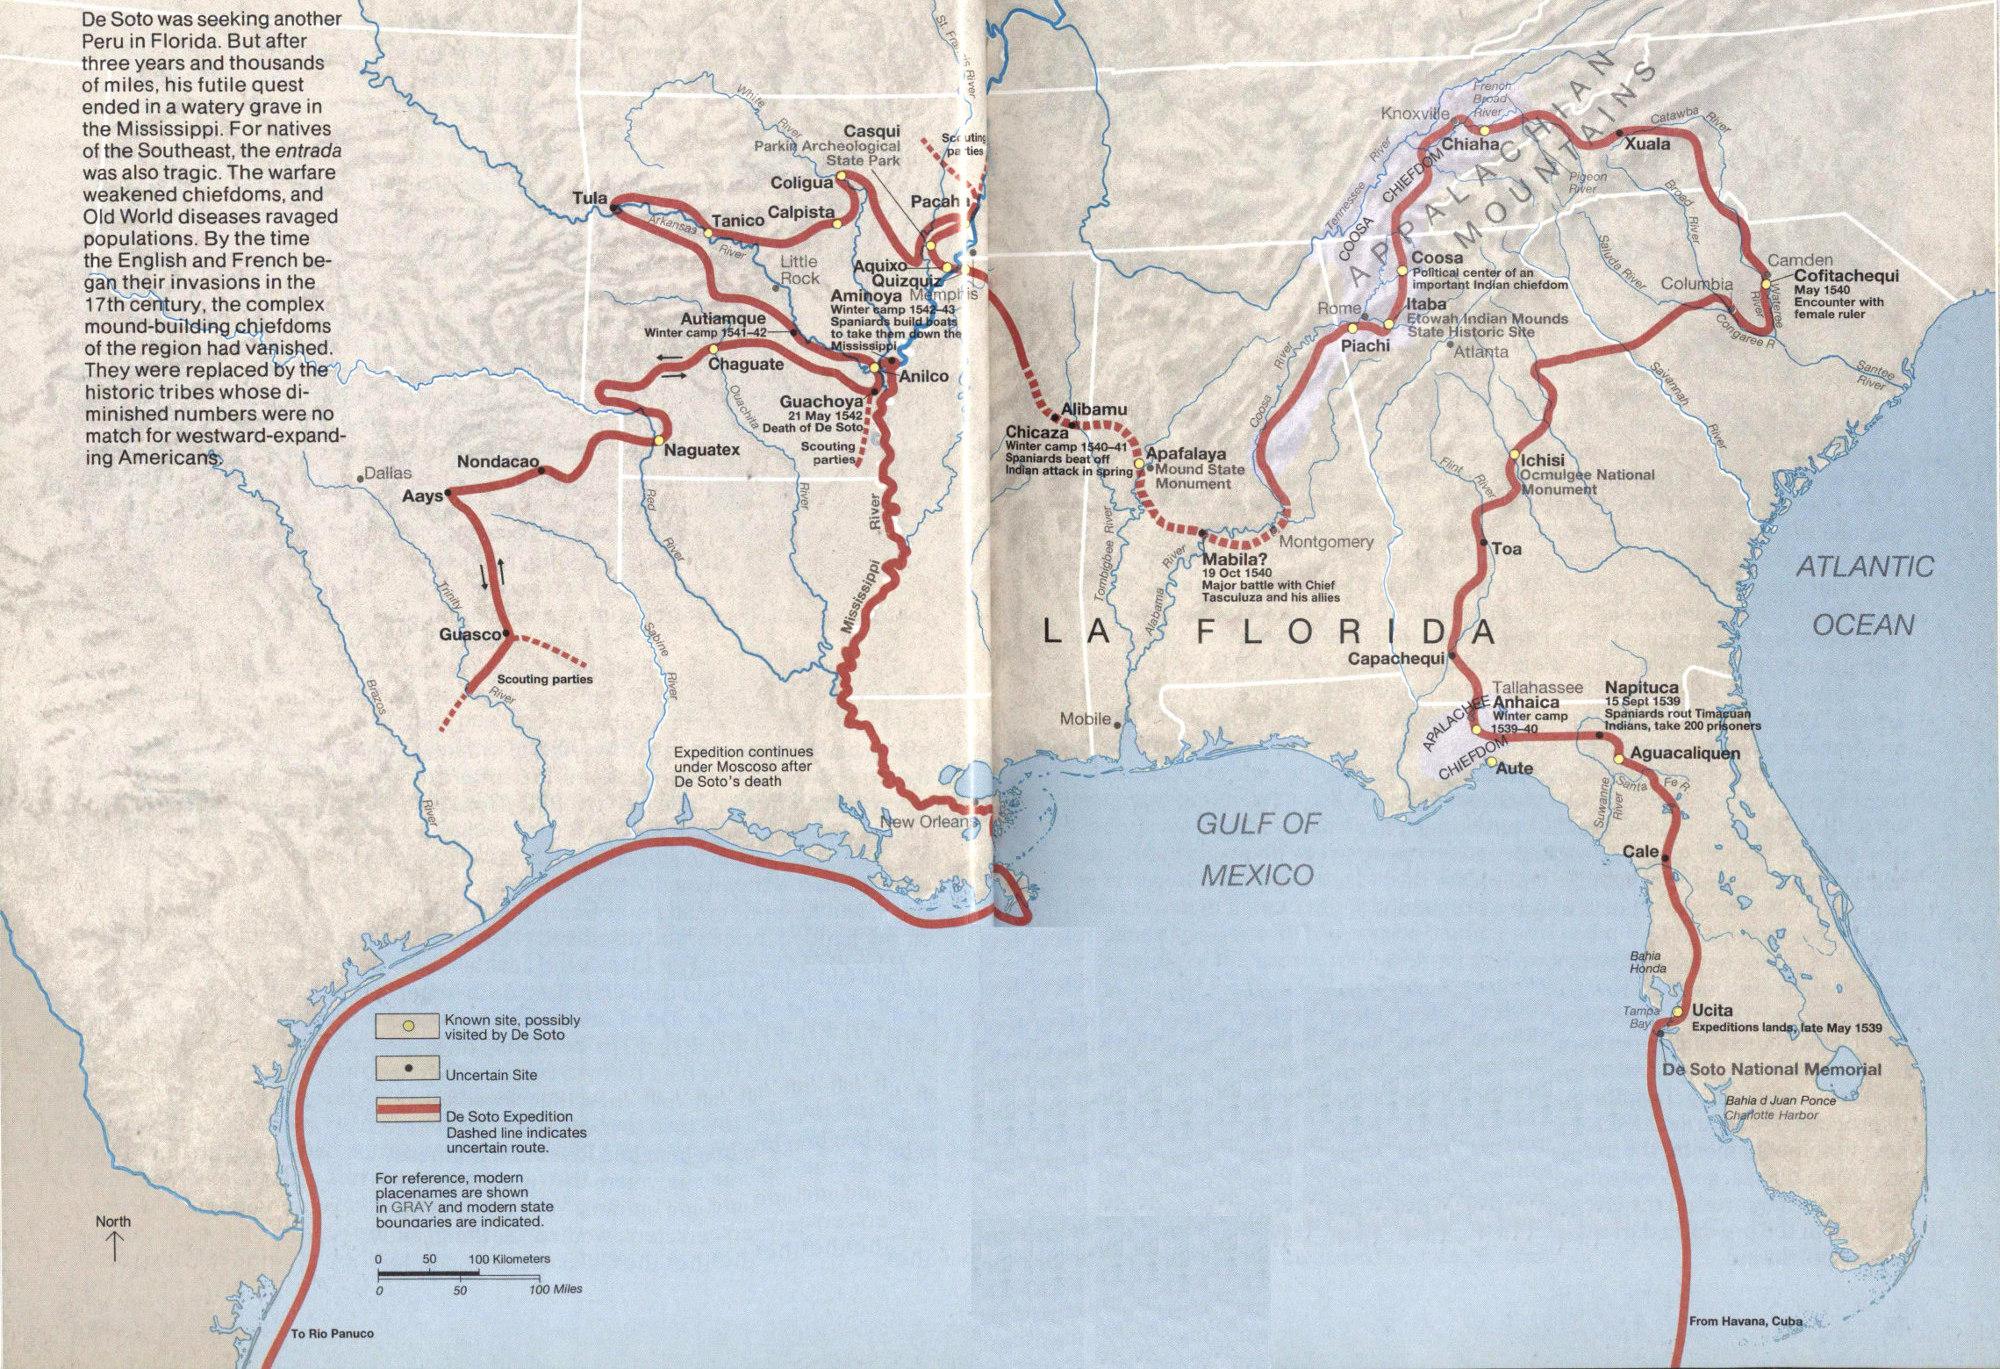 De soto coronado cabrillo a project gutenberg ebook high resolution map fandeluxe Image collections